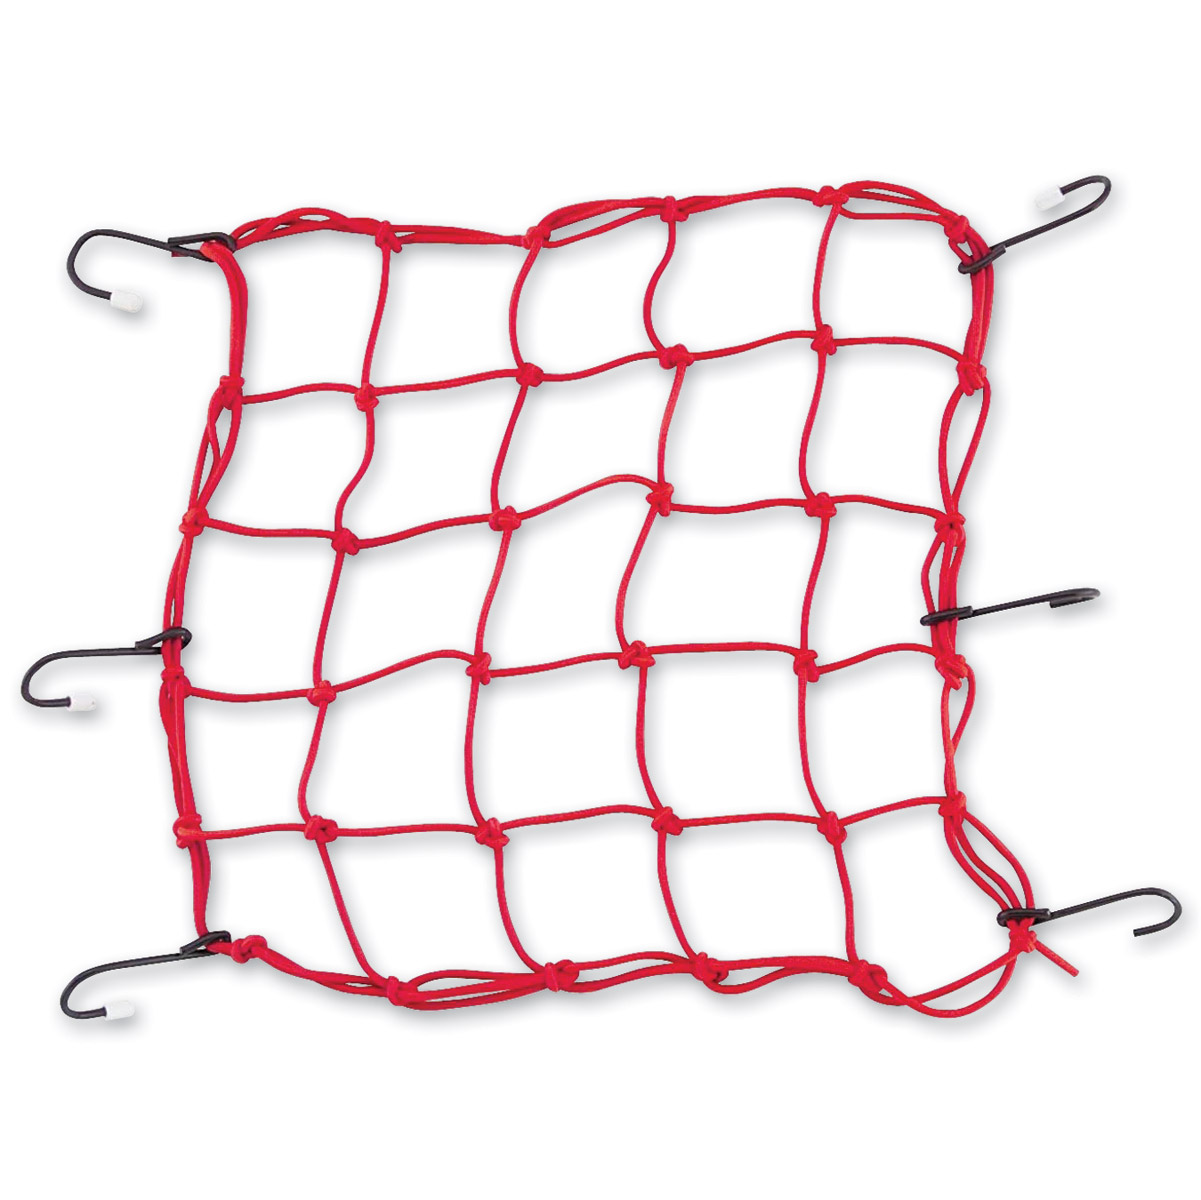 BikeMaster Red Stretch Net